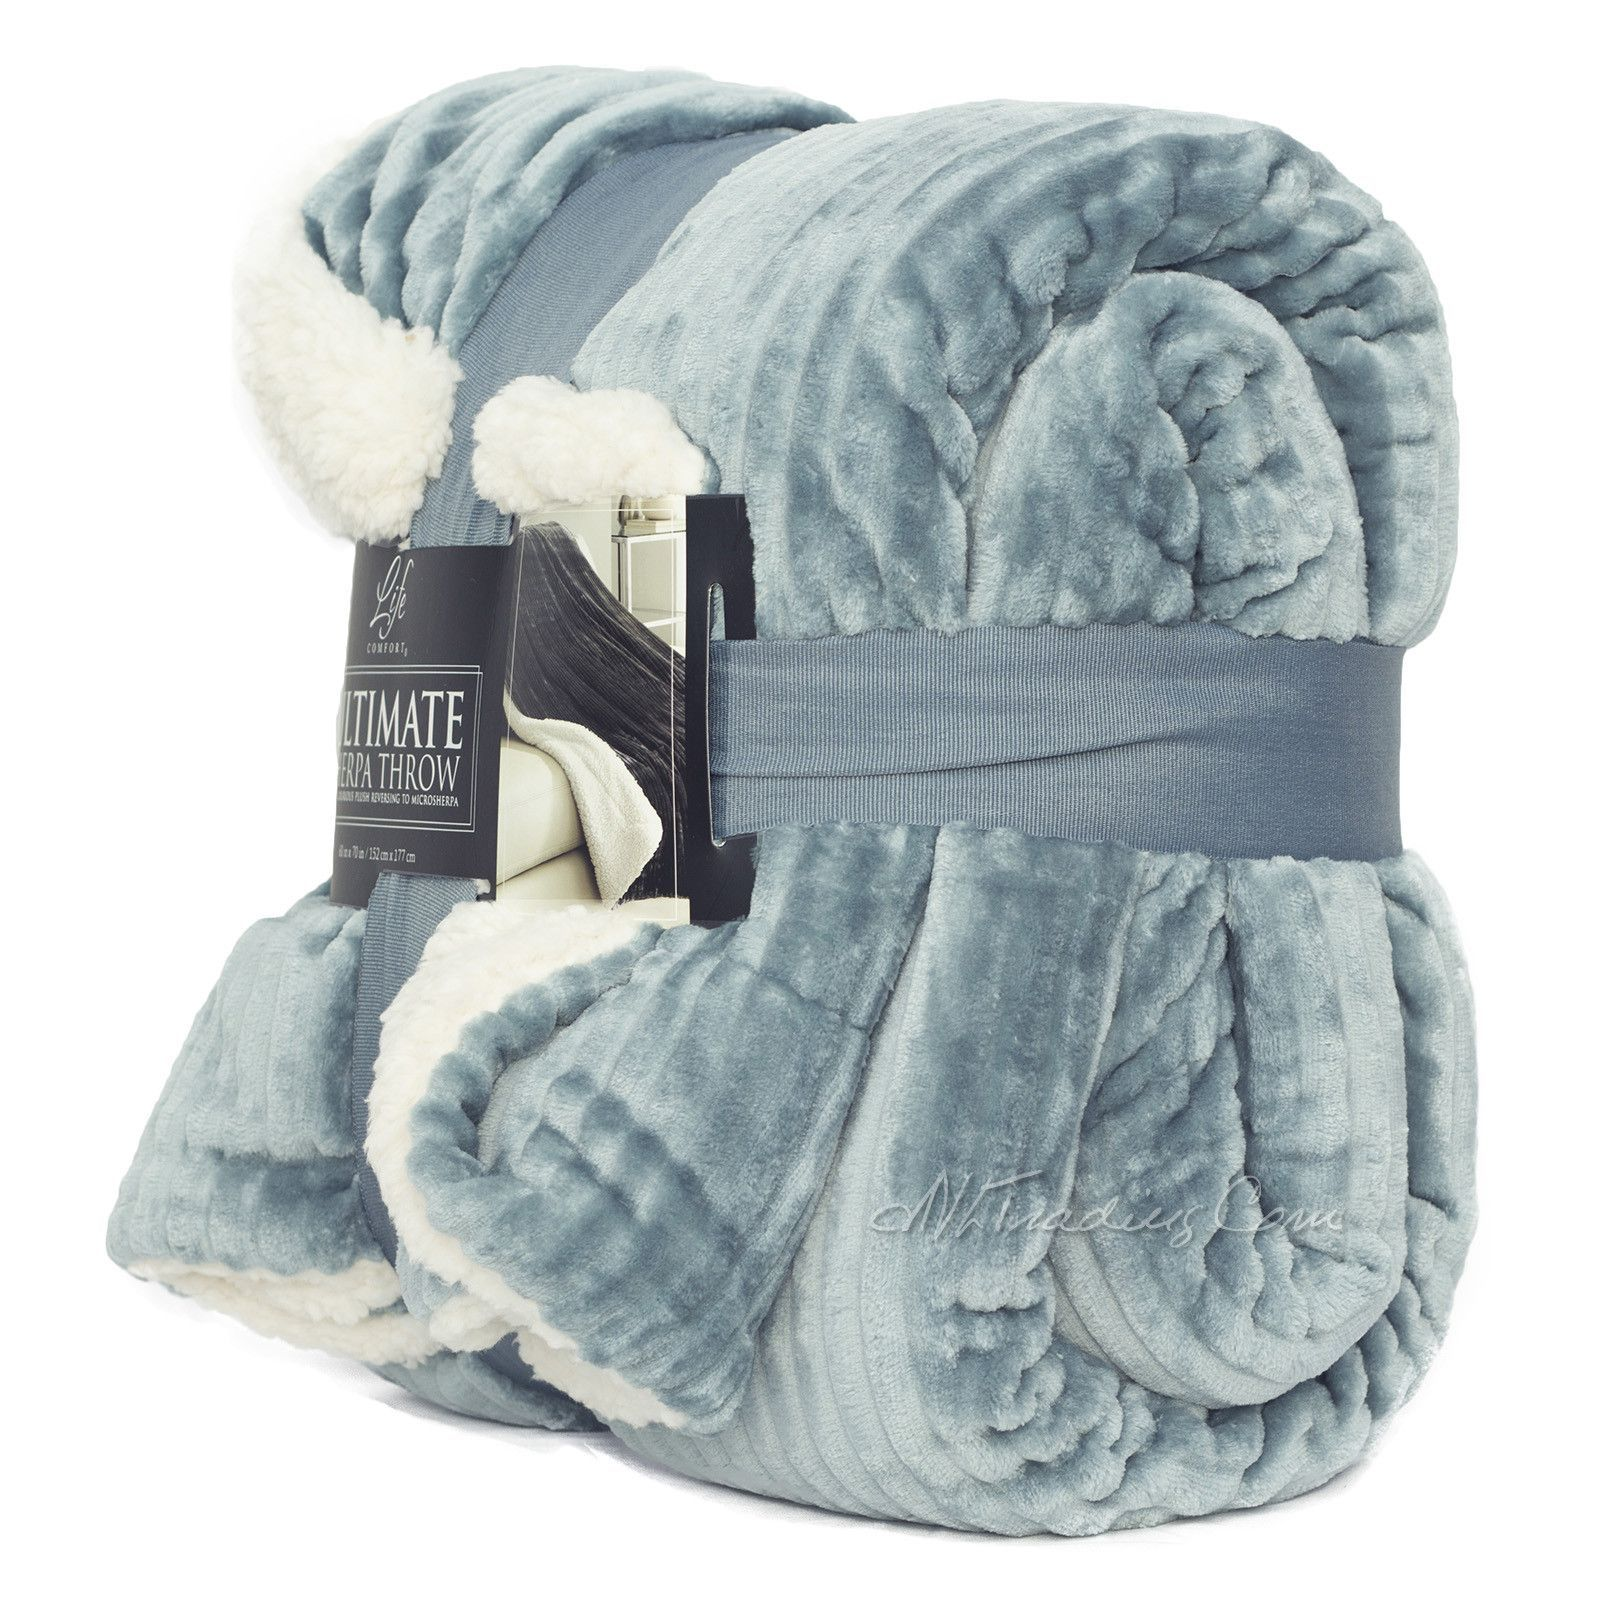 life comfort blanket Life Comfort WARM ULTRA SOFT Ultimate SHERPA THROW BLANKET  life comfort blanket